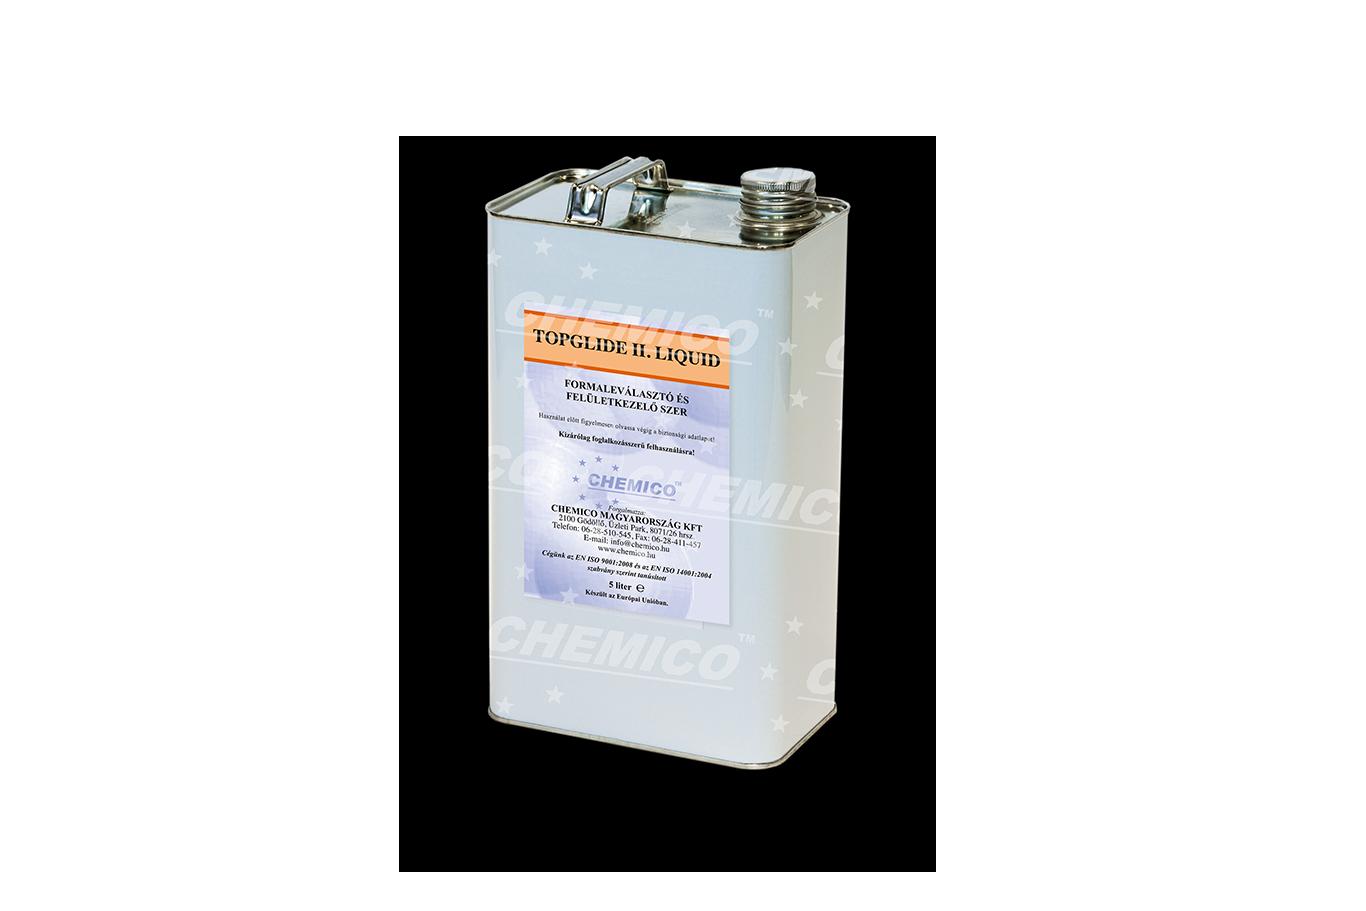 topglide-liquid-ii-formalevalaszto-surlodas-csokkento-feluletkezelo-ipari-chemico